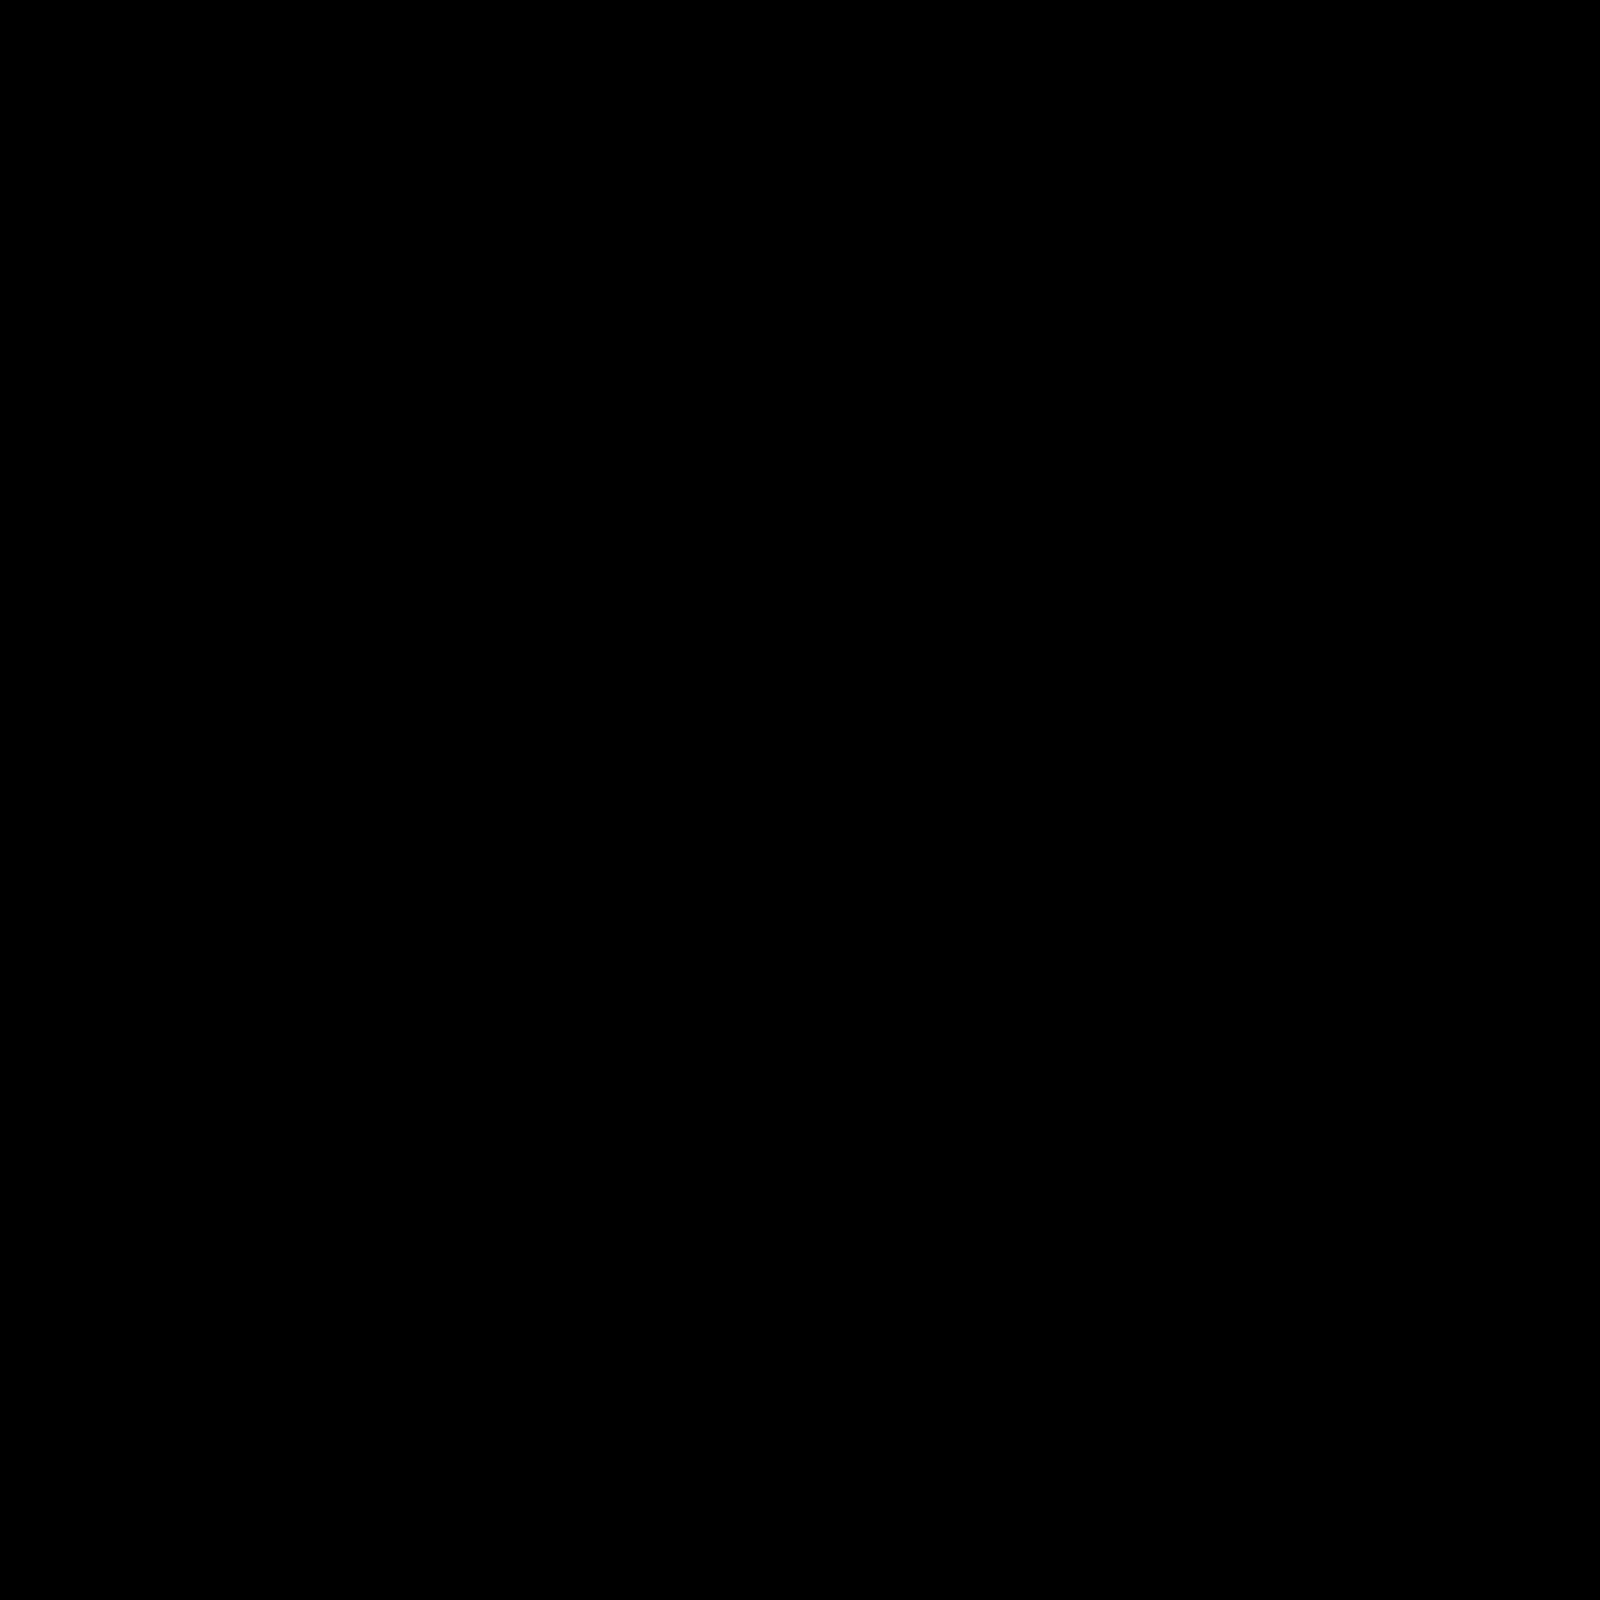 Puzzel Pice (blue) SVG Clip arts